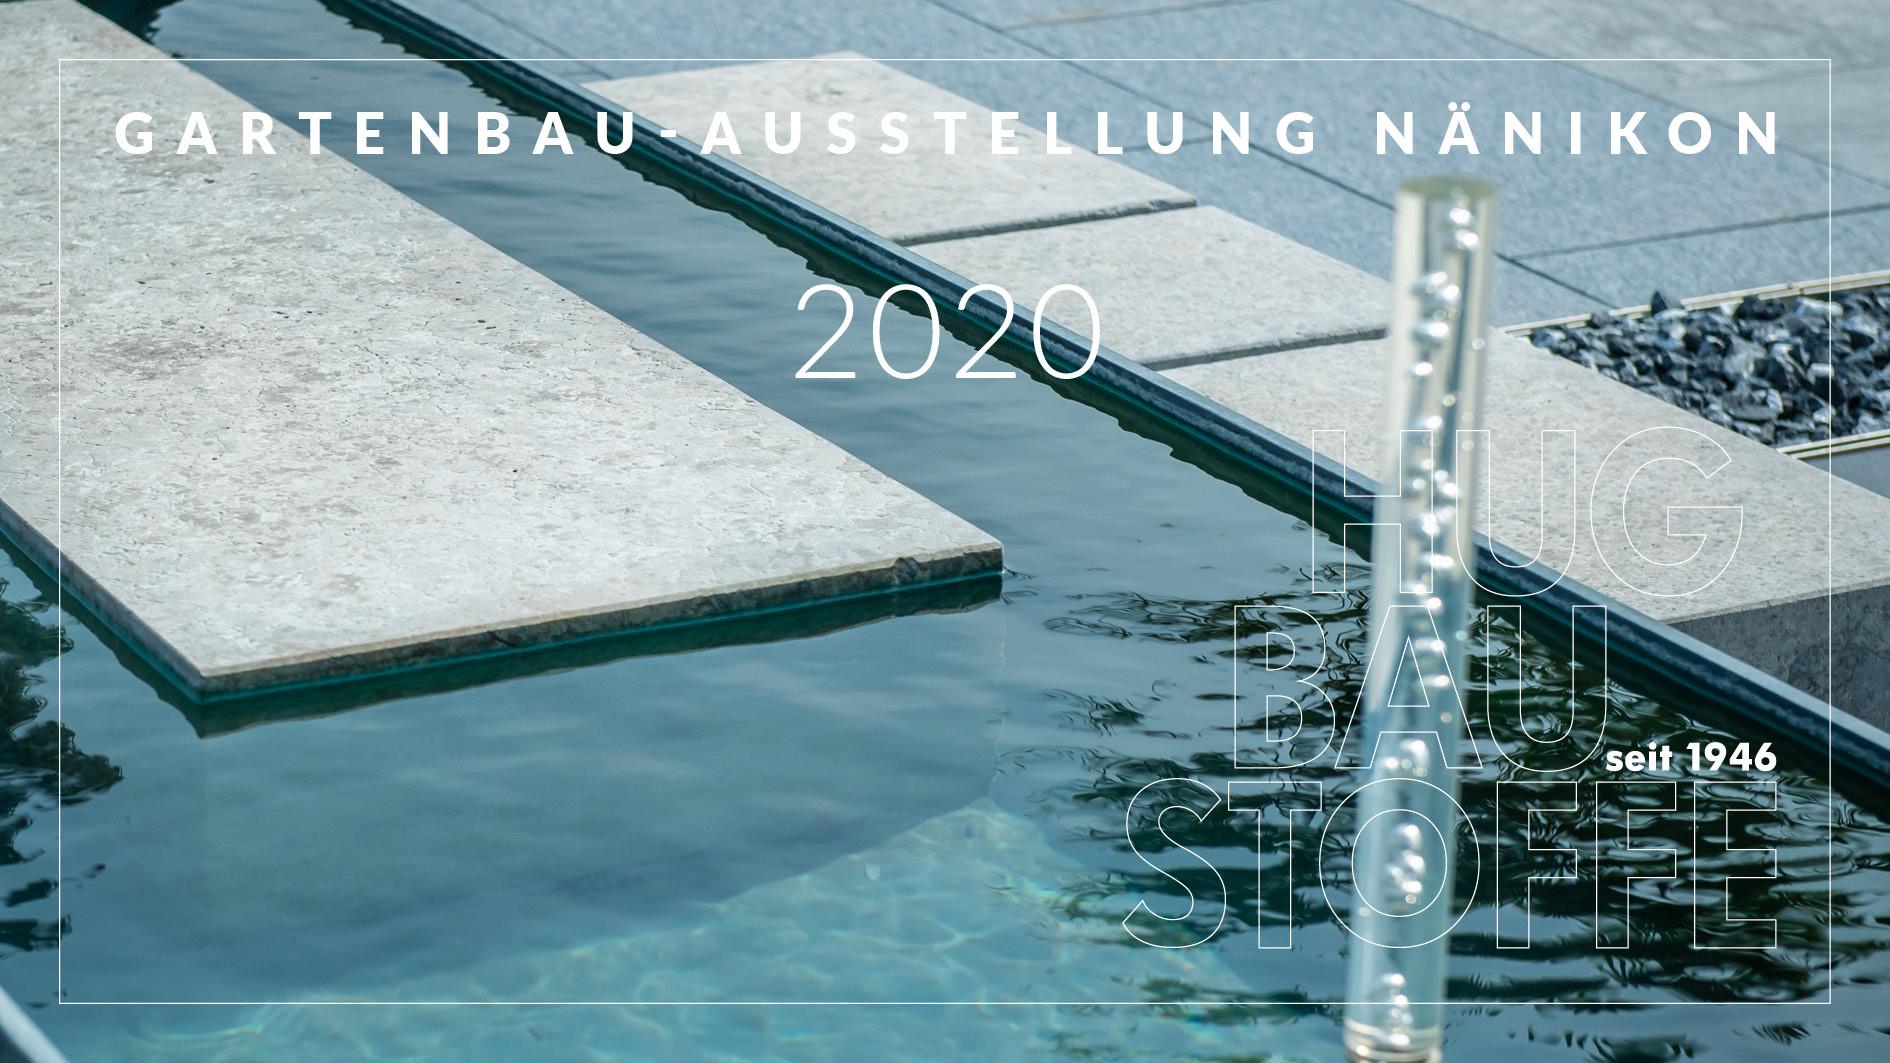 Hug Gartenbau Ausstellung 2020 16zu9 neu